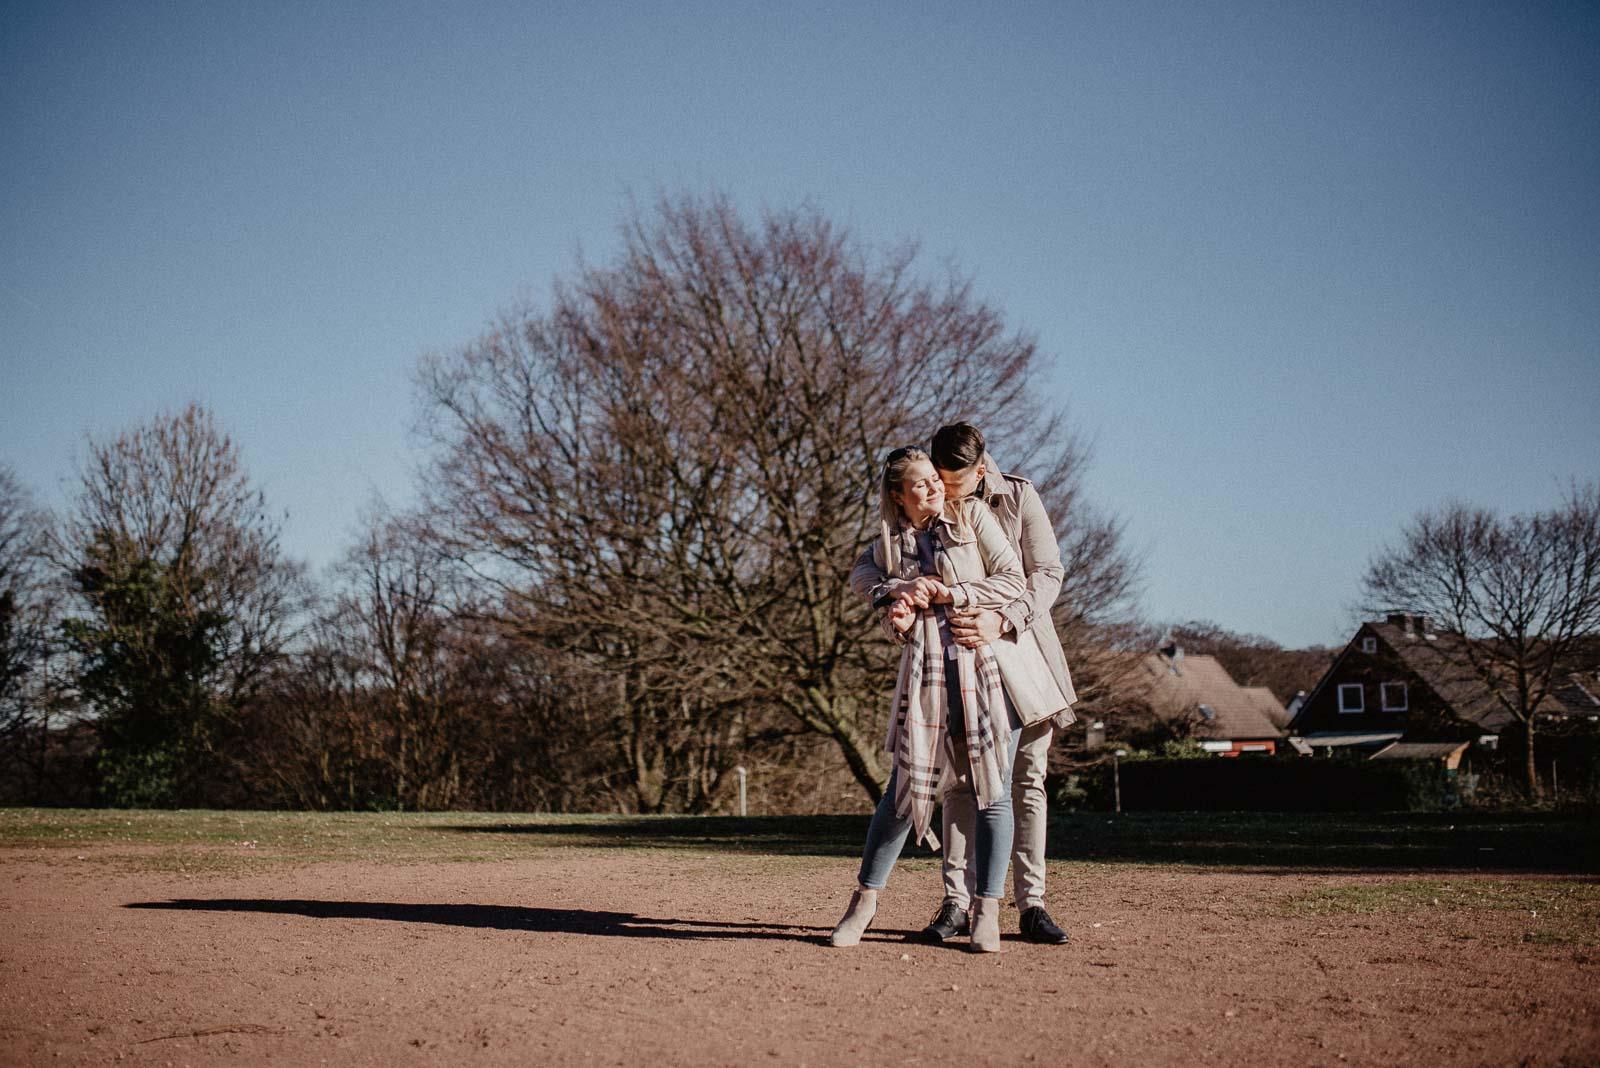 035-fotospaziergang-fotograf-witten-paarshooting